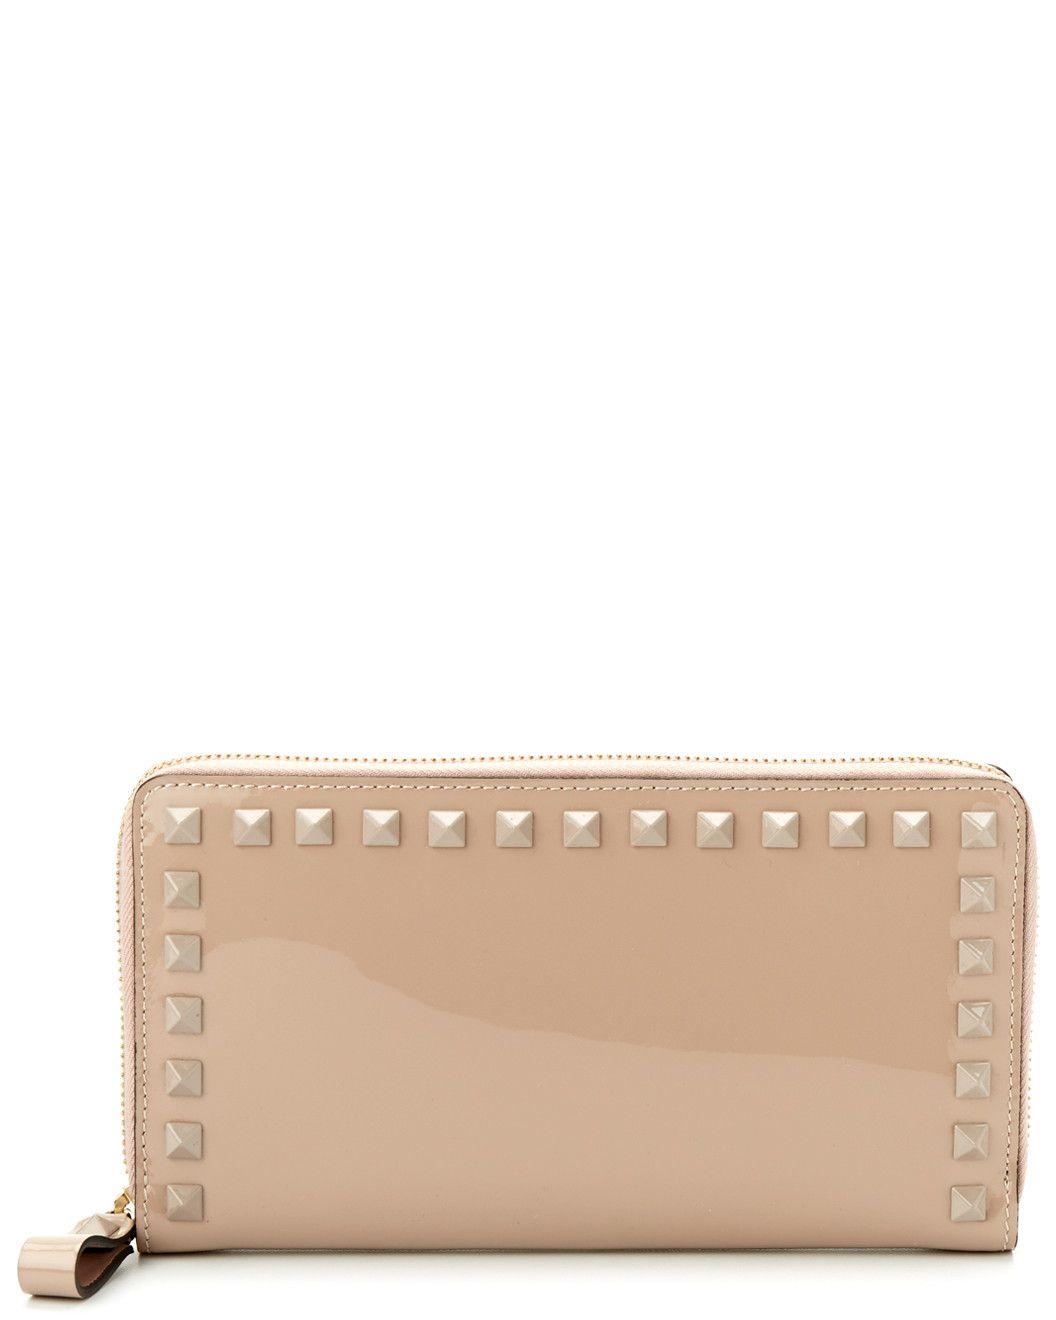 Spotted this Valentino Rockstud Patent Zip-Around Wallet on Rue La La. Shop (quickly!).